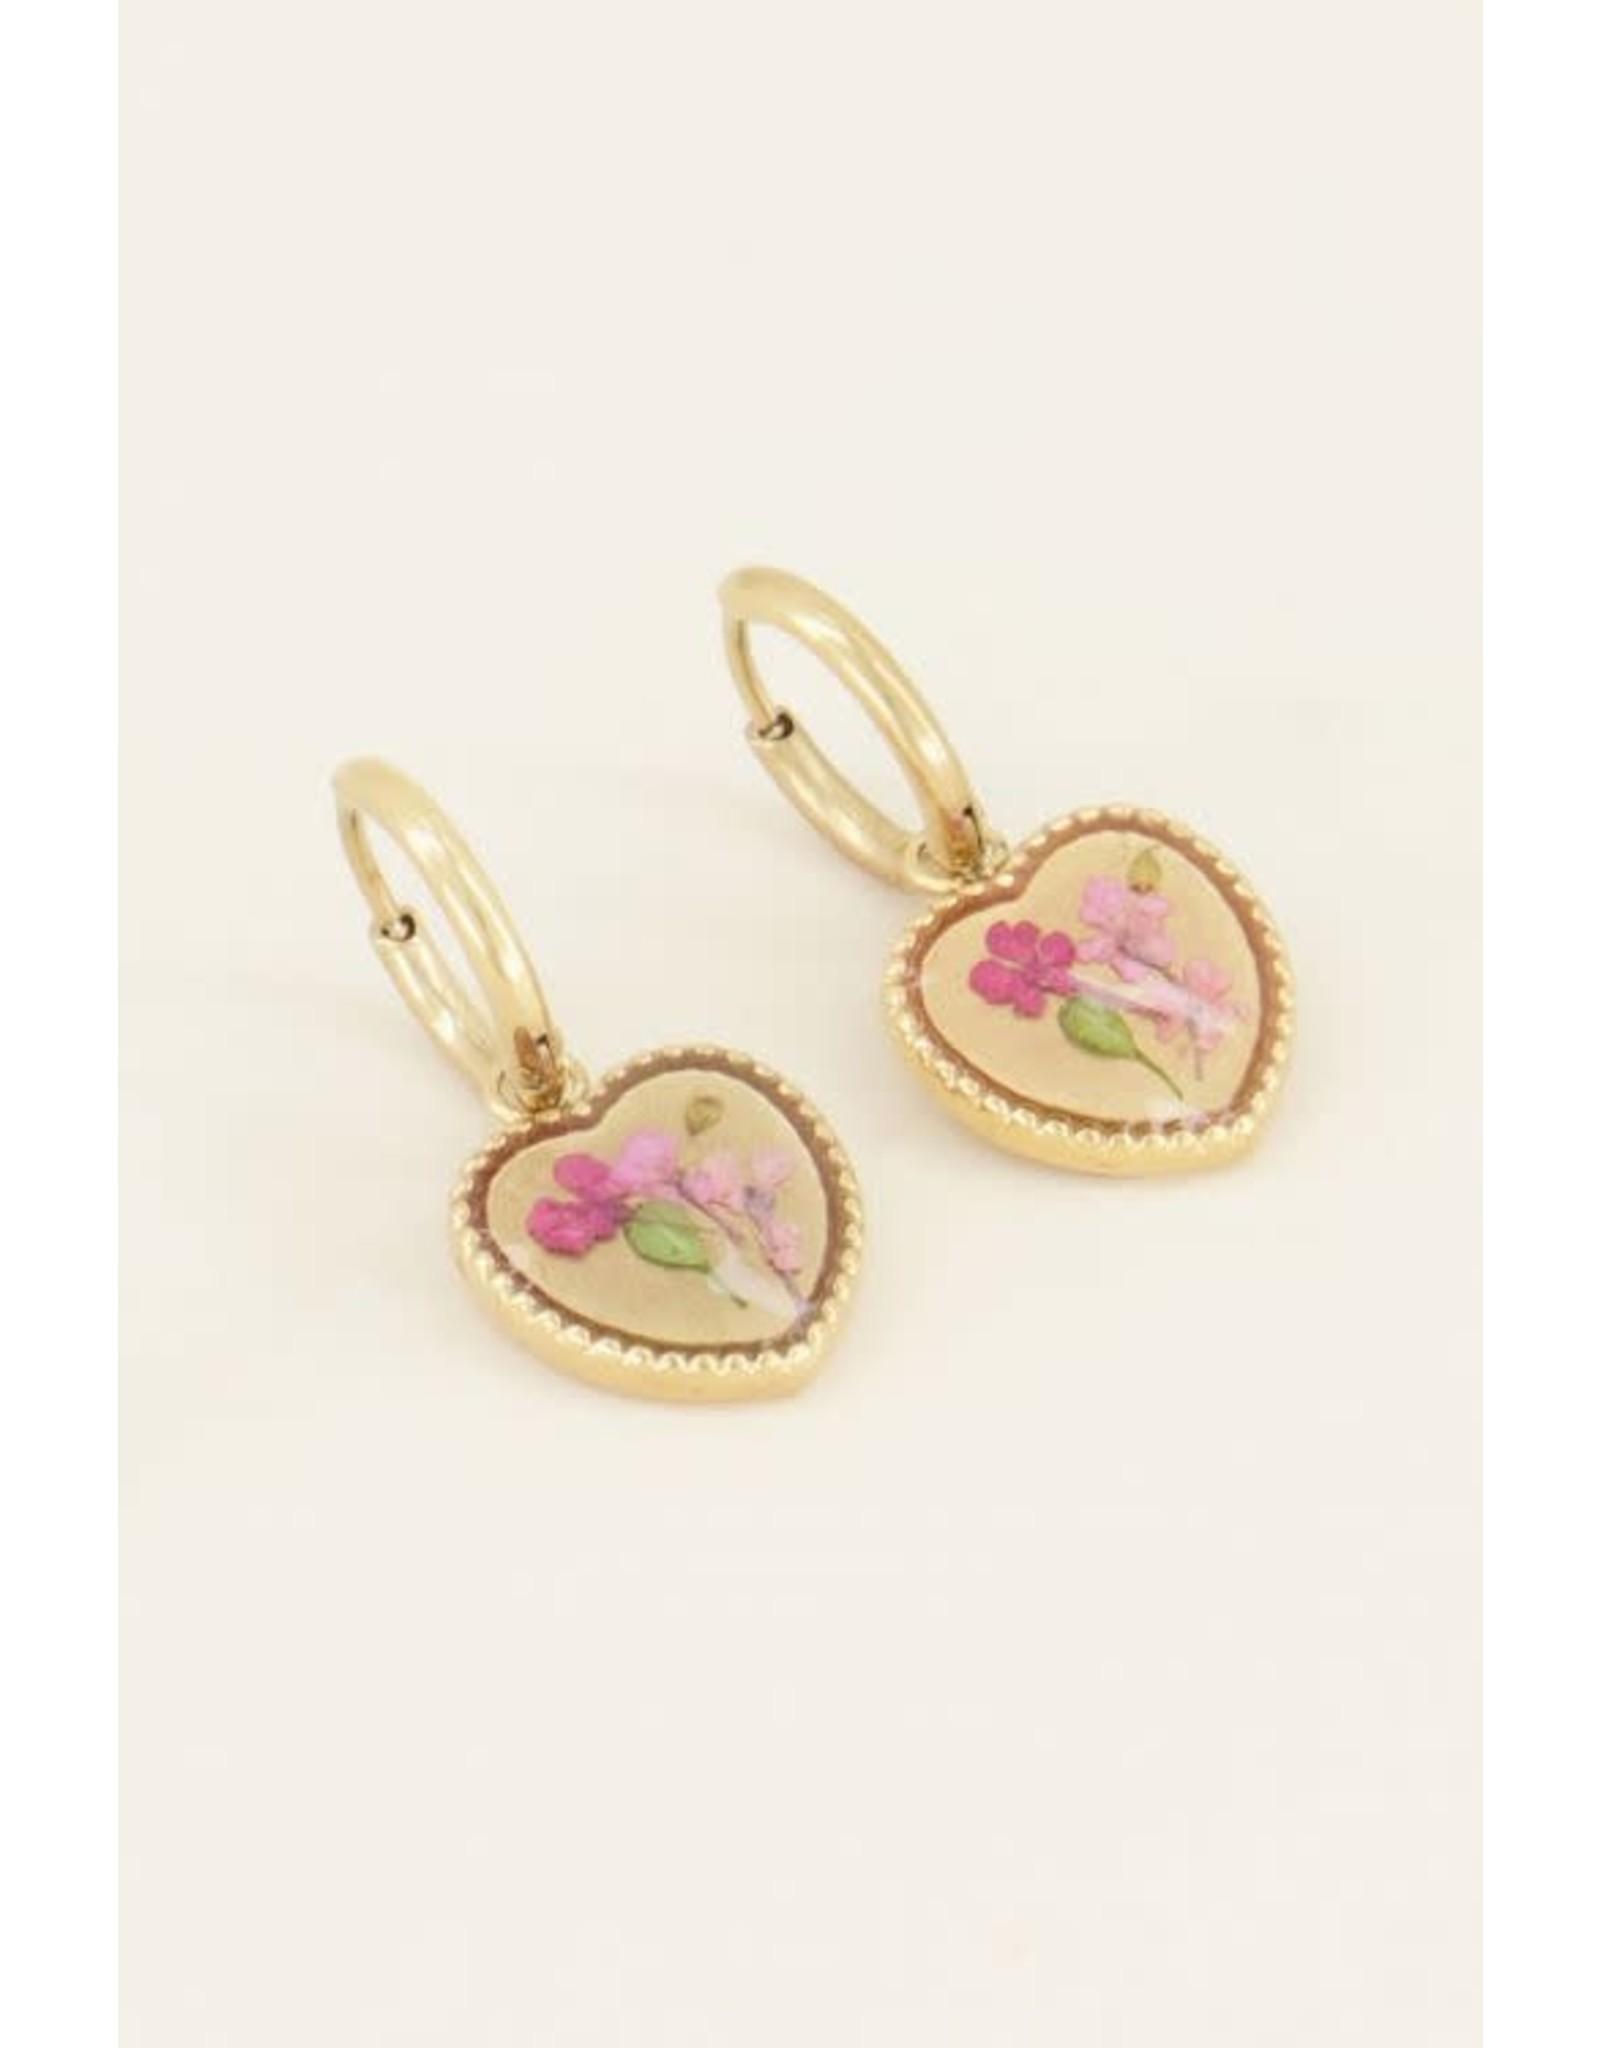 My Jewellery My Jewellery wild flower oorbellen